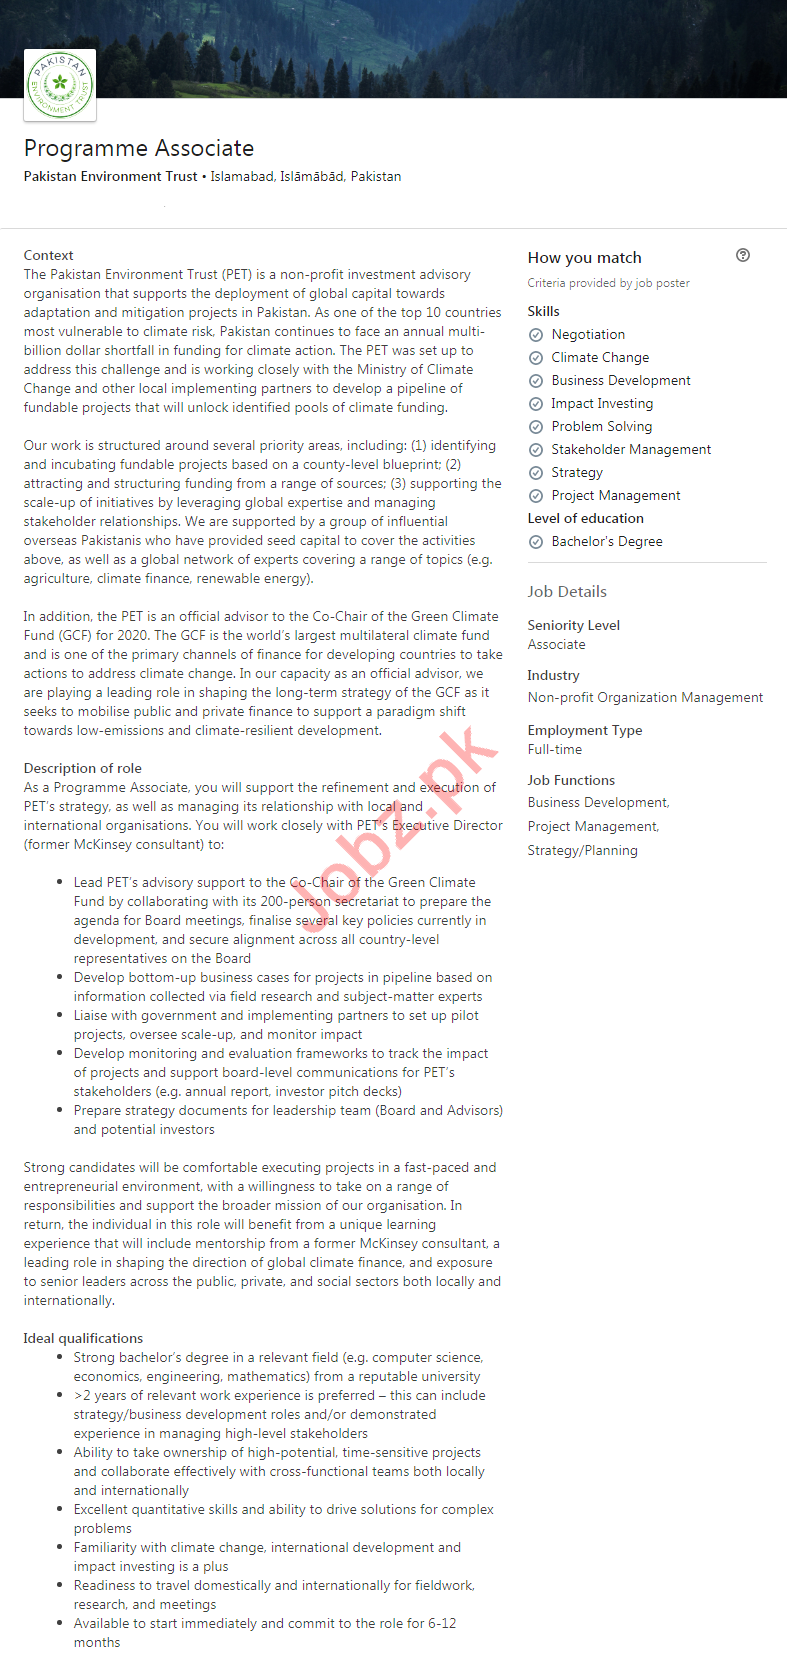 Pakistan Environment Trust NGO Jobs in Islamabad 2020